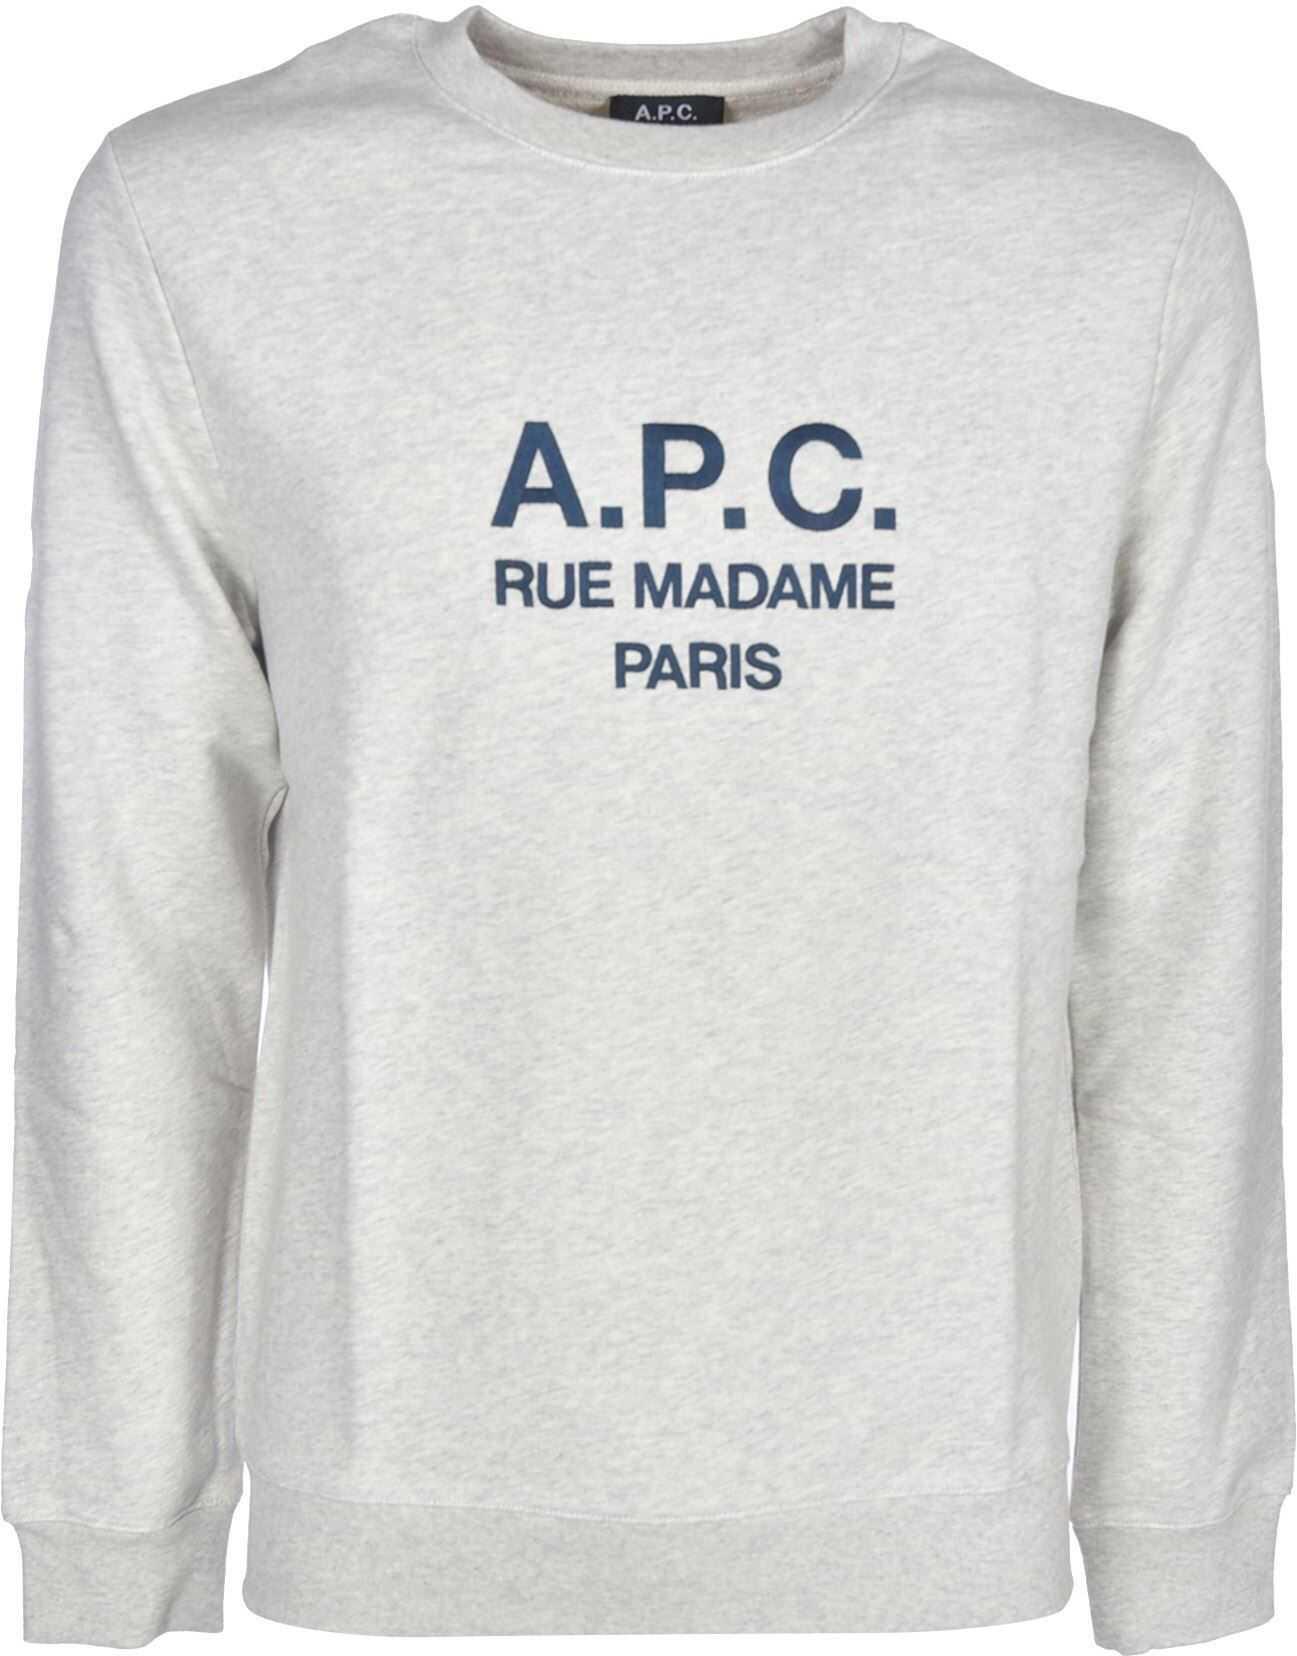 A.P.C. Rufus Crewneck Sweatshirt In Light Grey Grey imagine